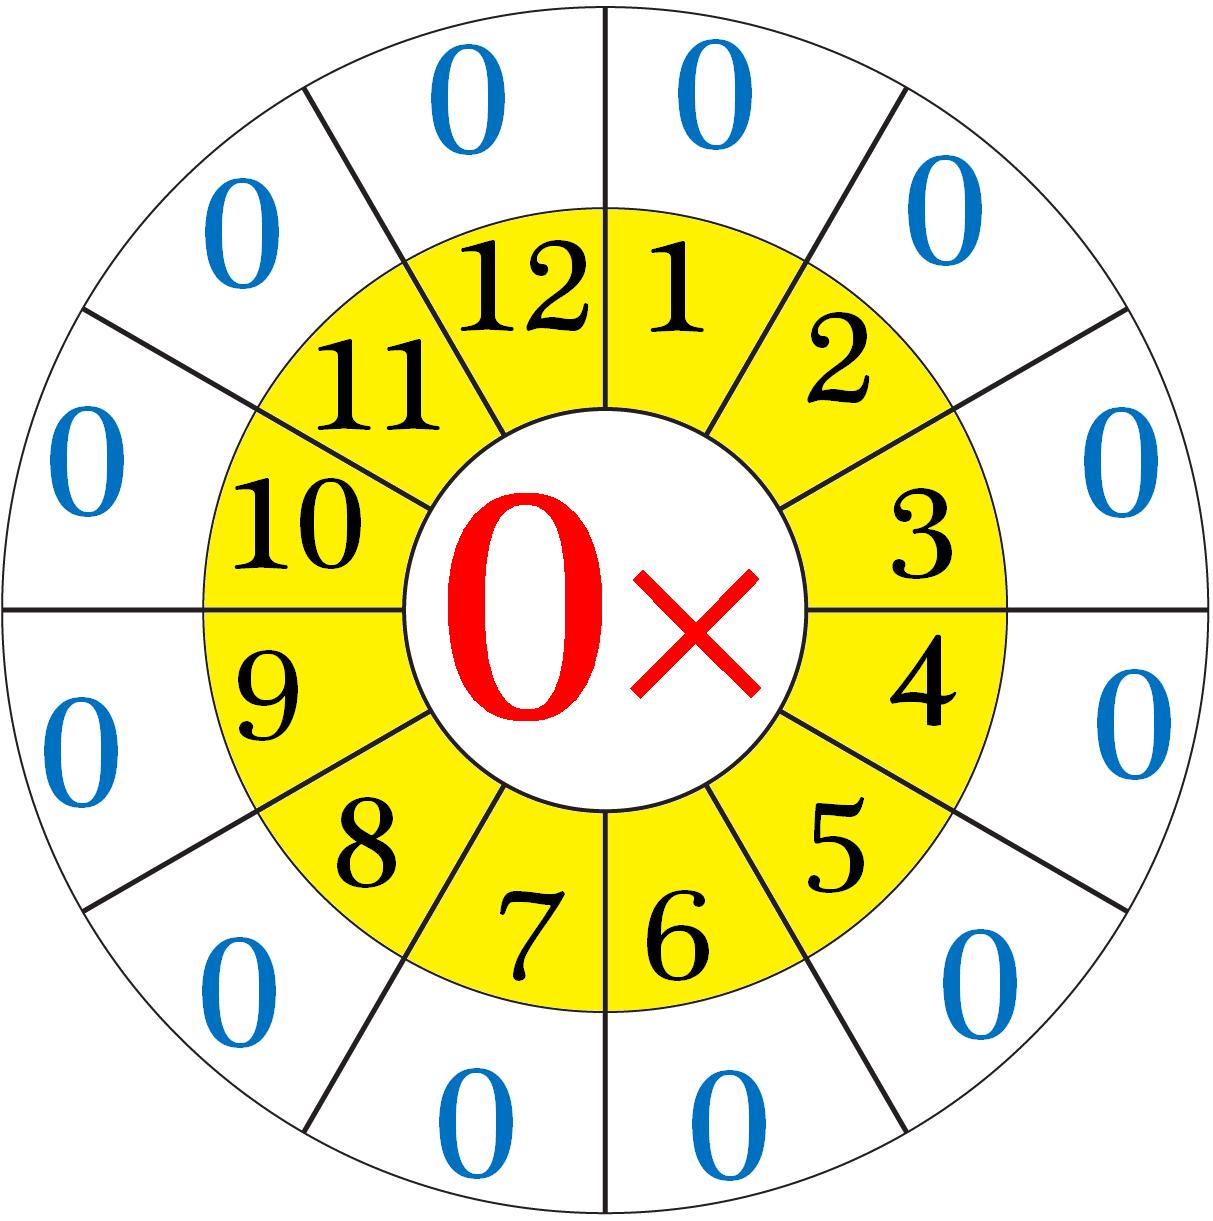 Multiplication Table of Zero